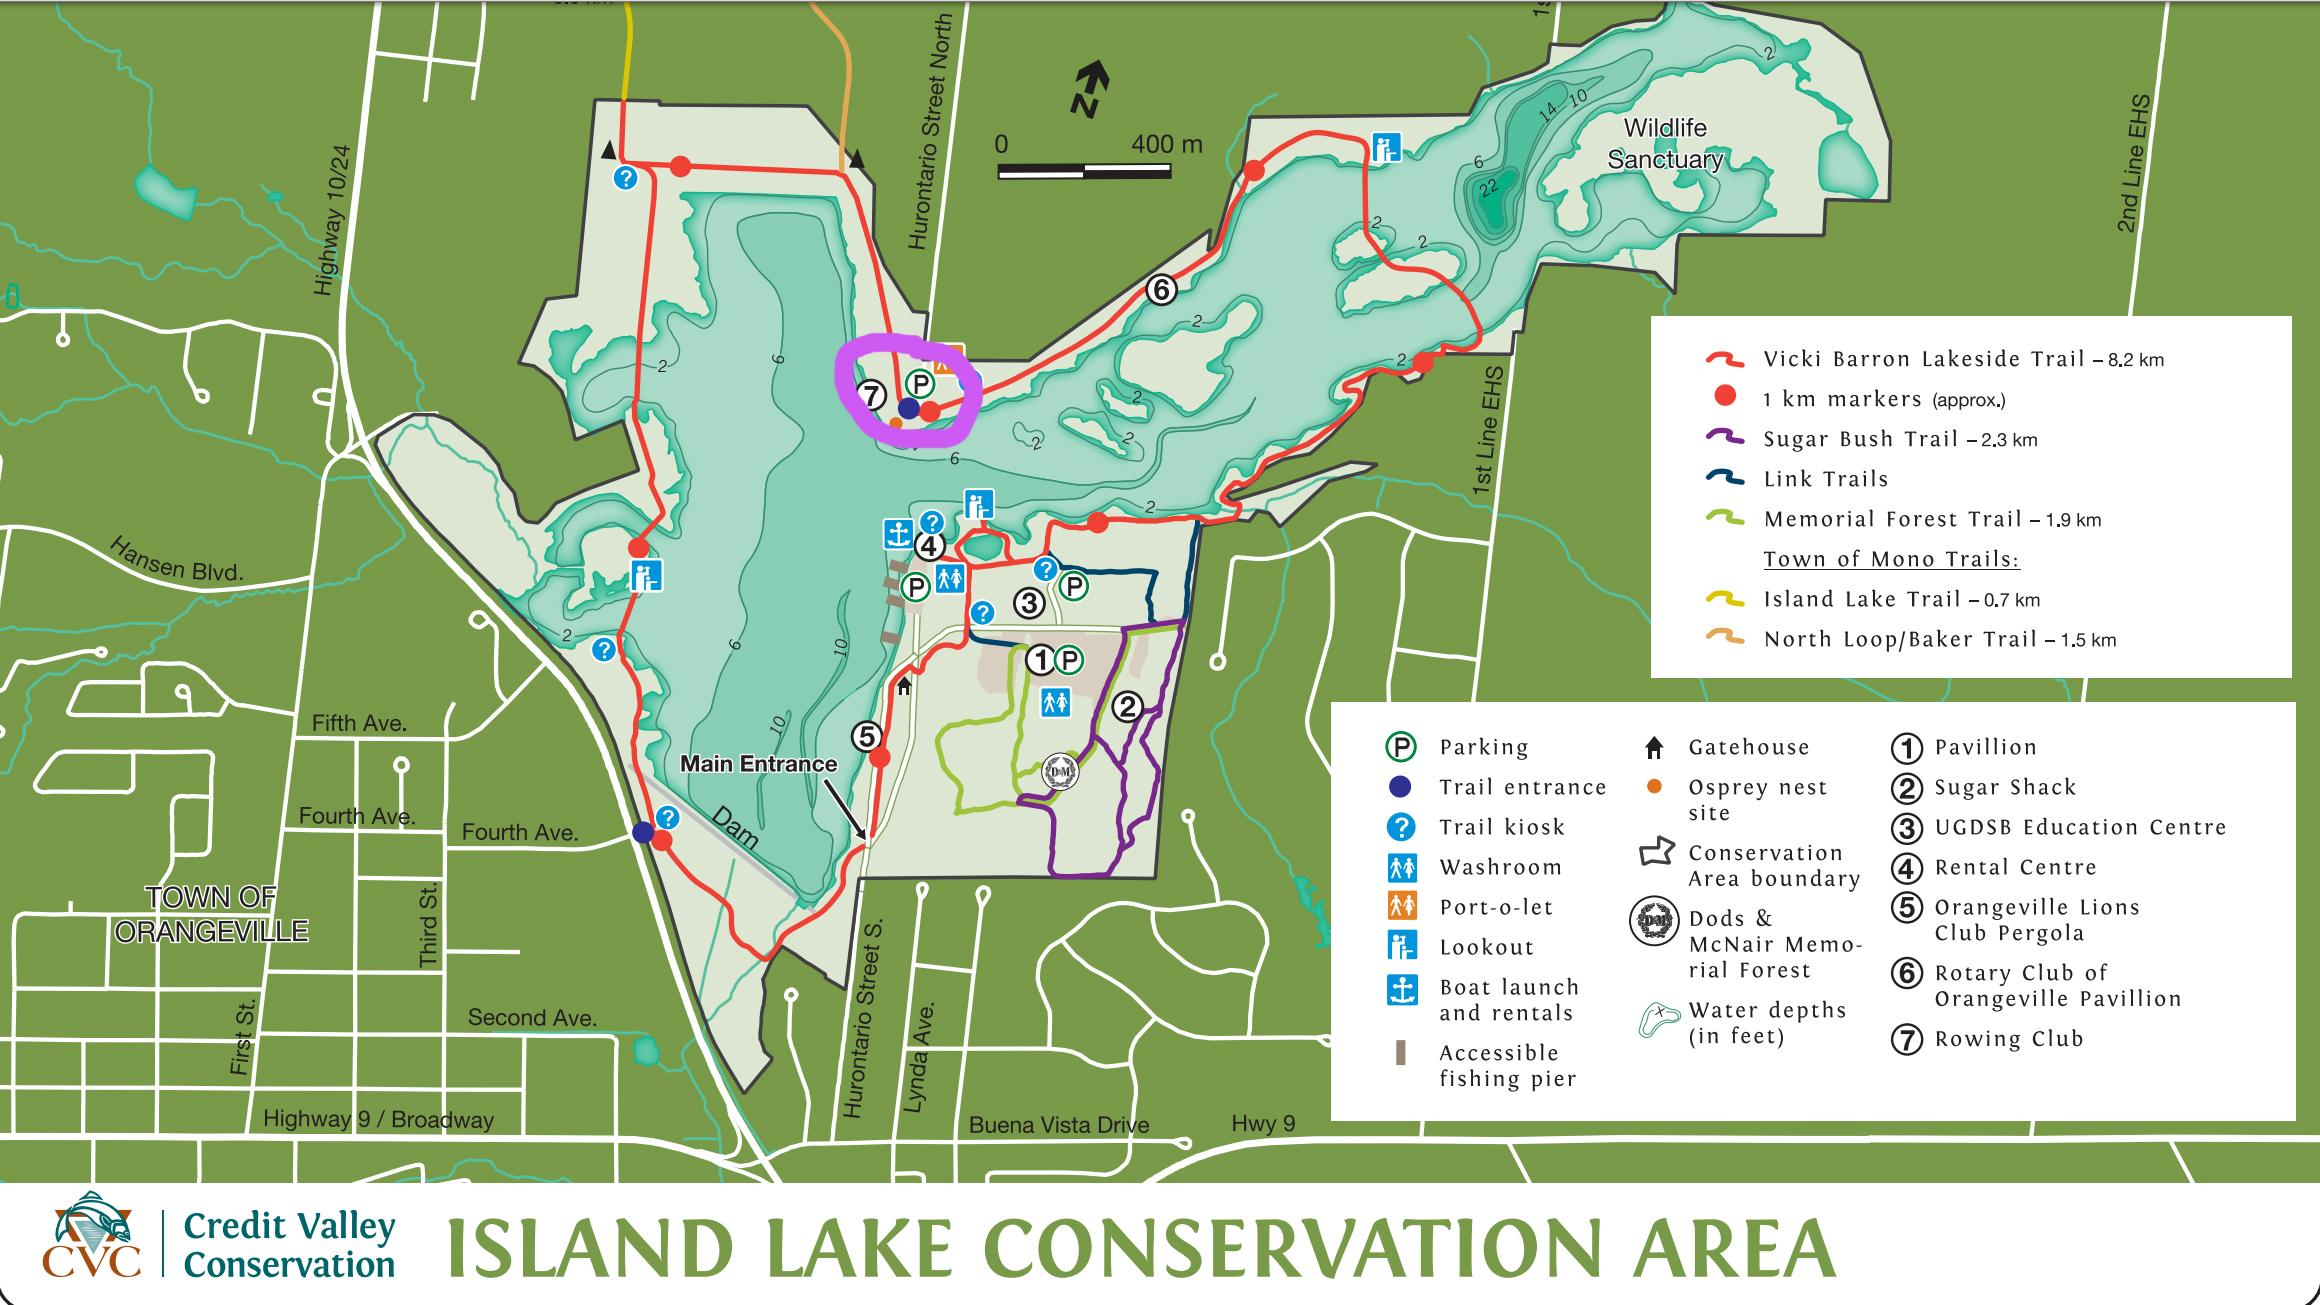 Island Lake State Park Map Island Lake Map | Lifeology 101